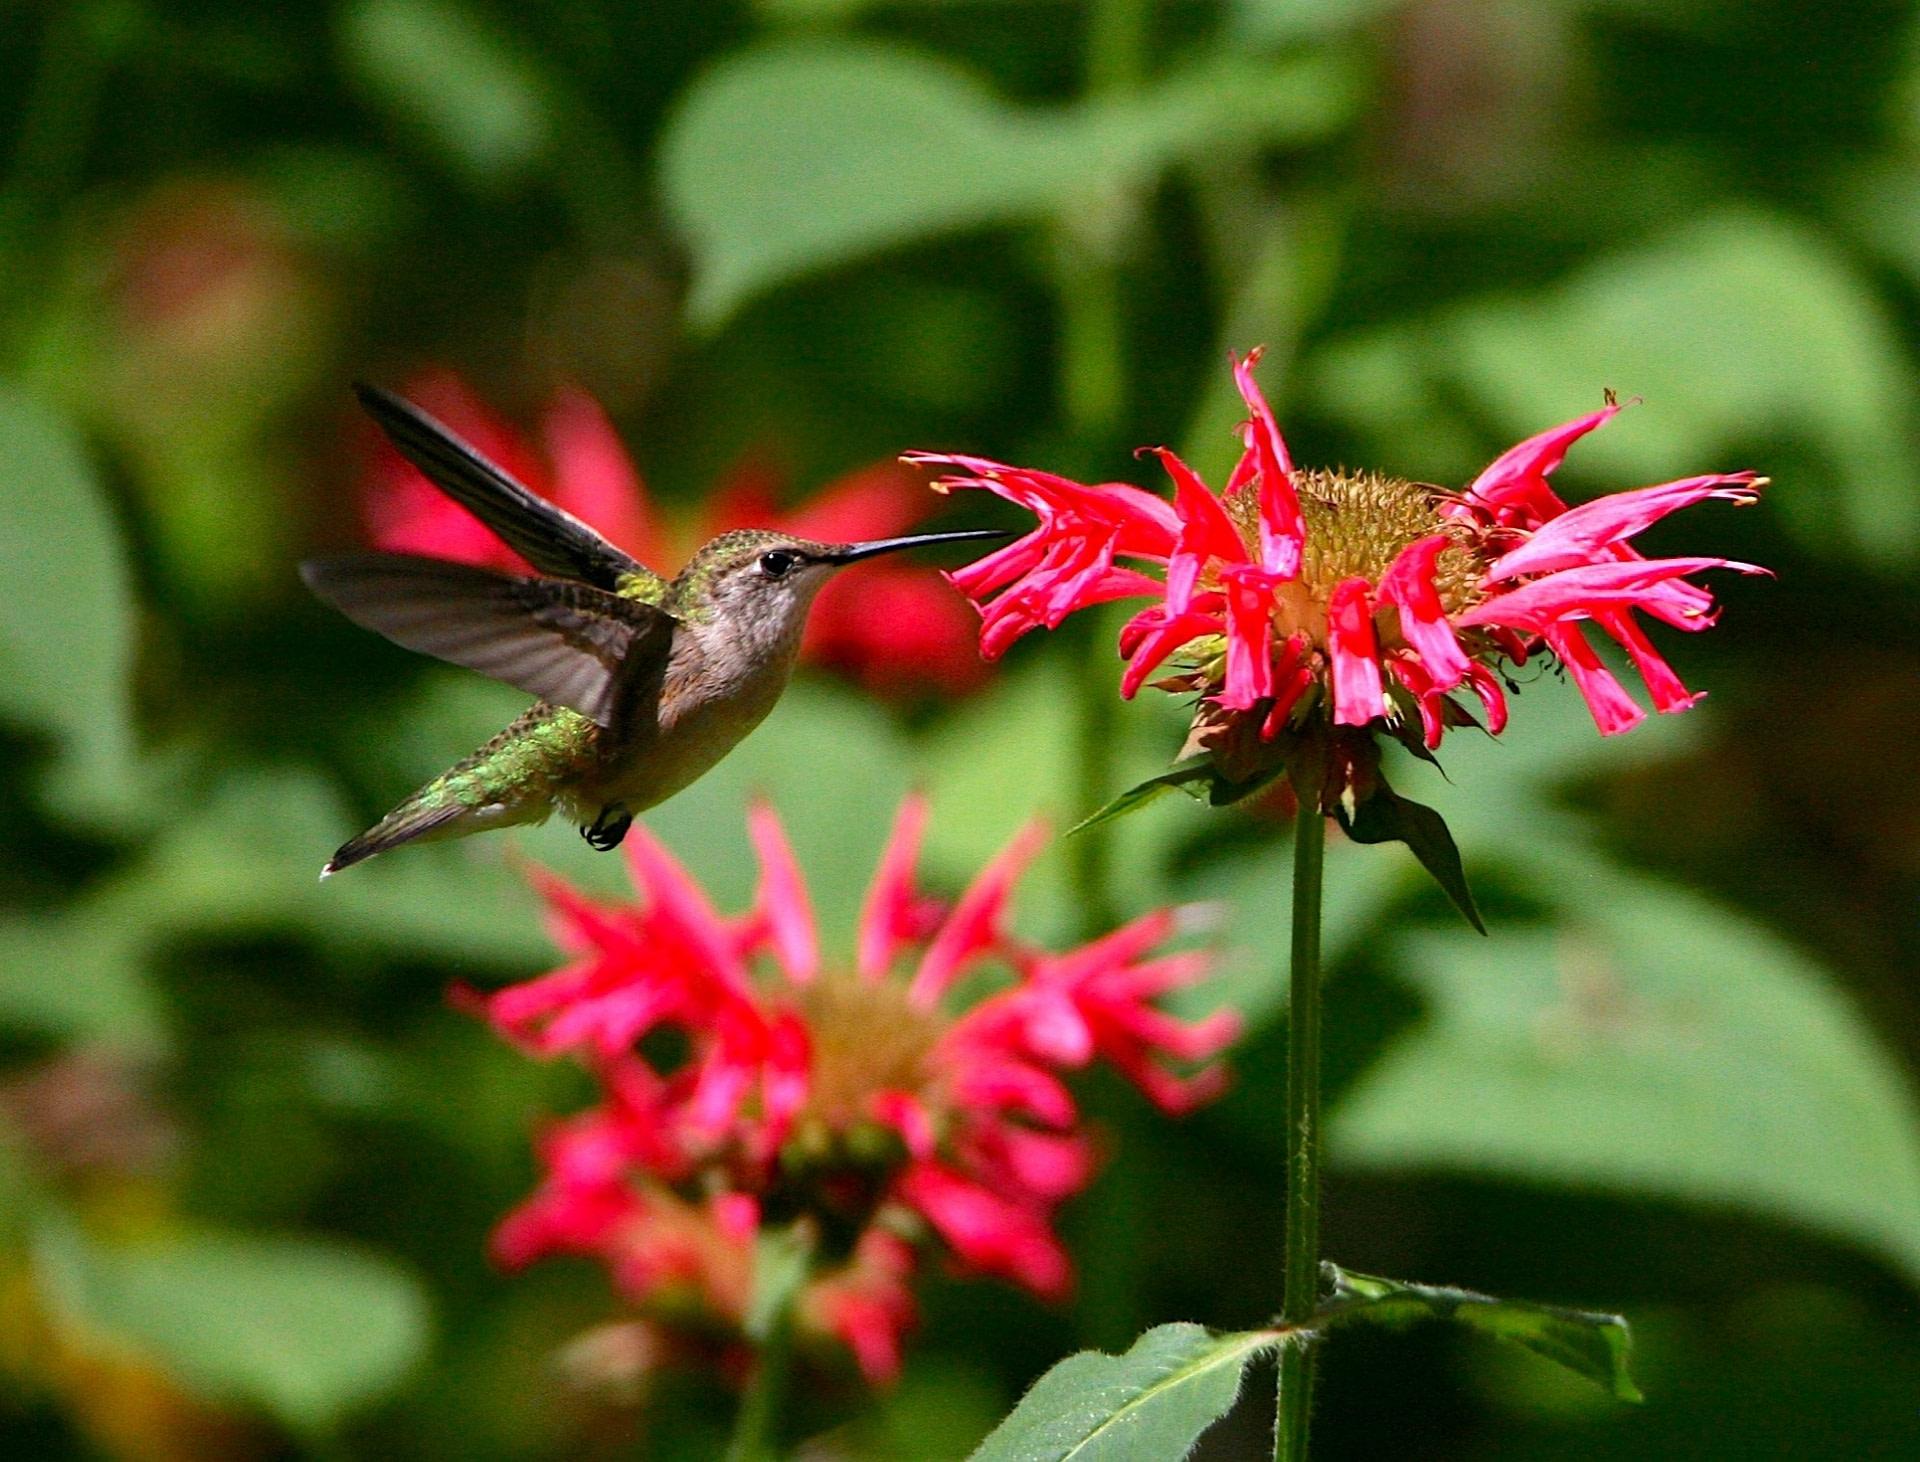 Ruby-throated Hummingbird on flower